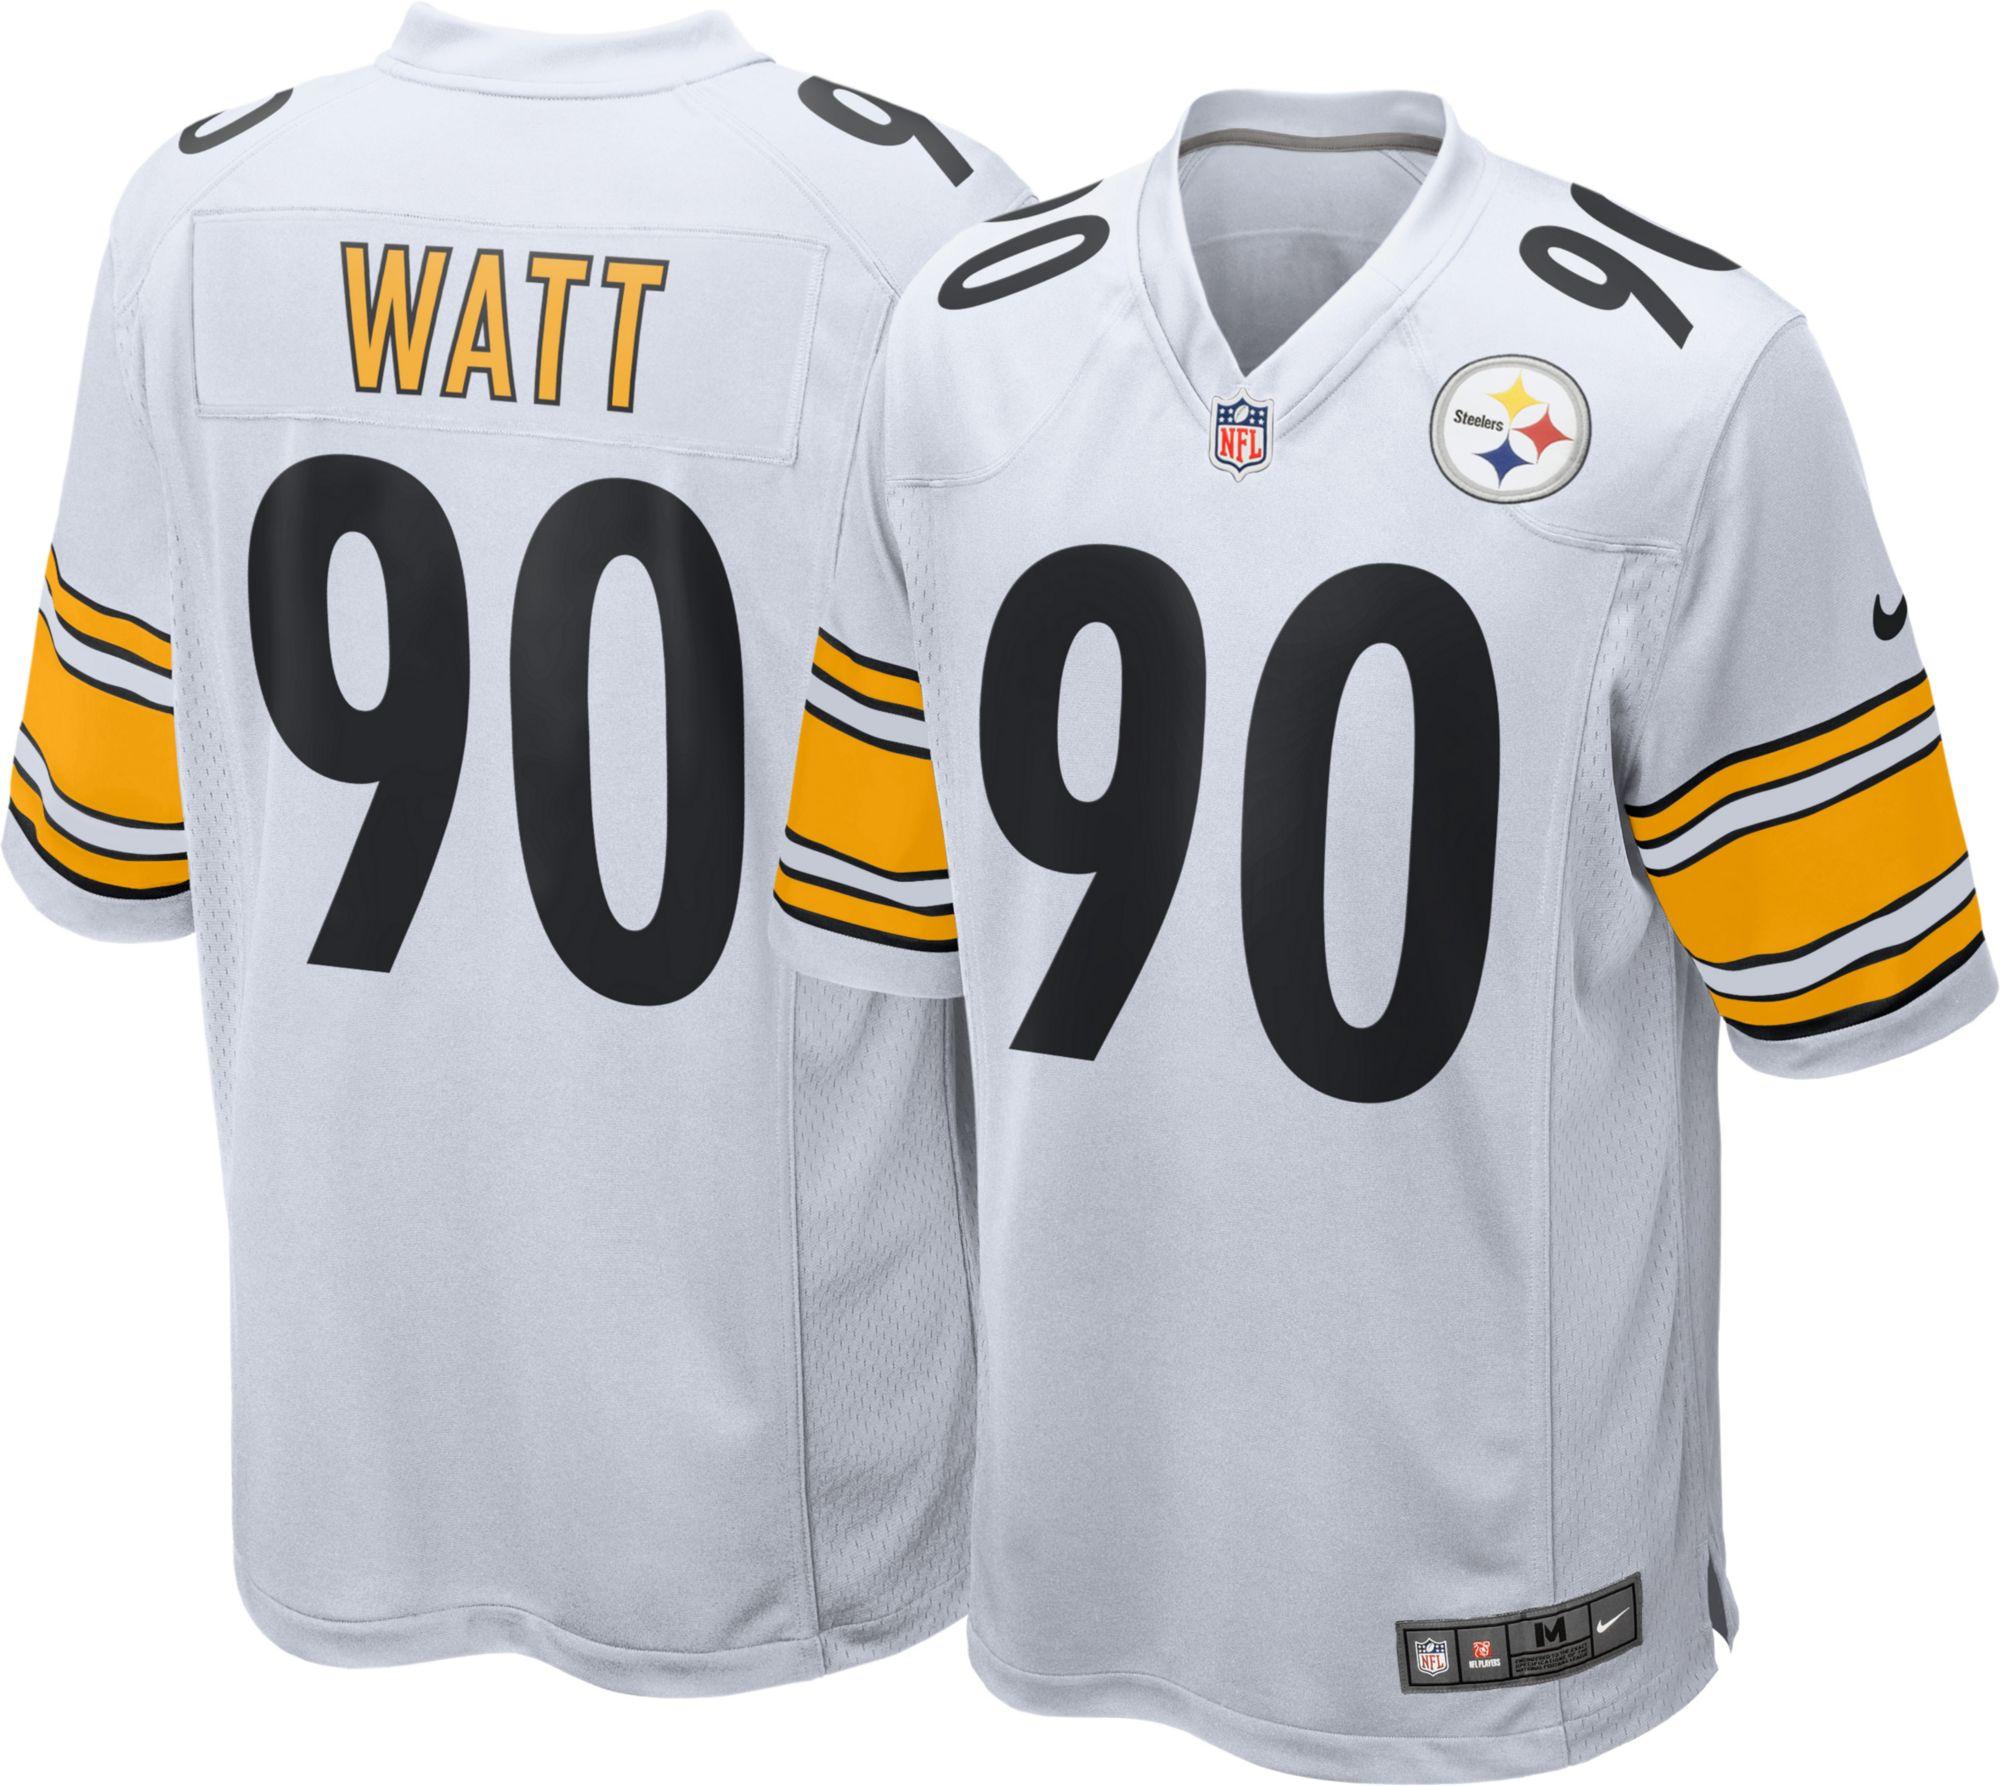 59511e530bc ... Home 88 Nike Mens Away Game Jersey Pittsburgh Steelers T.J. Watt 90 ...